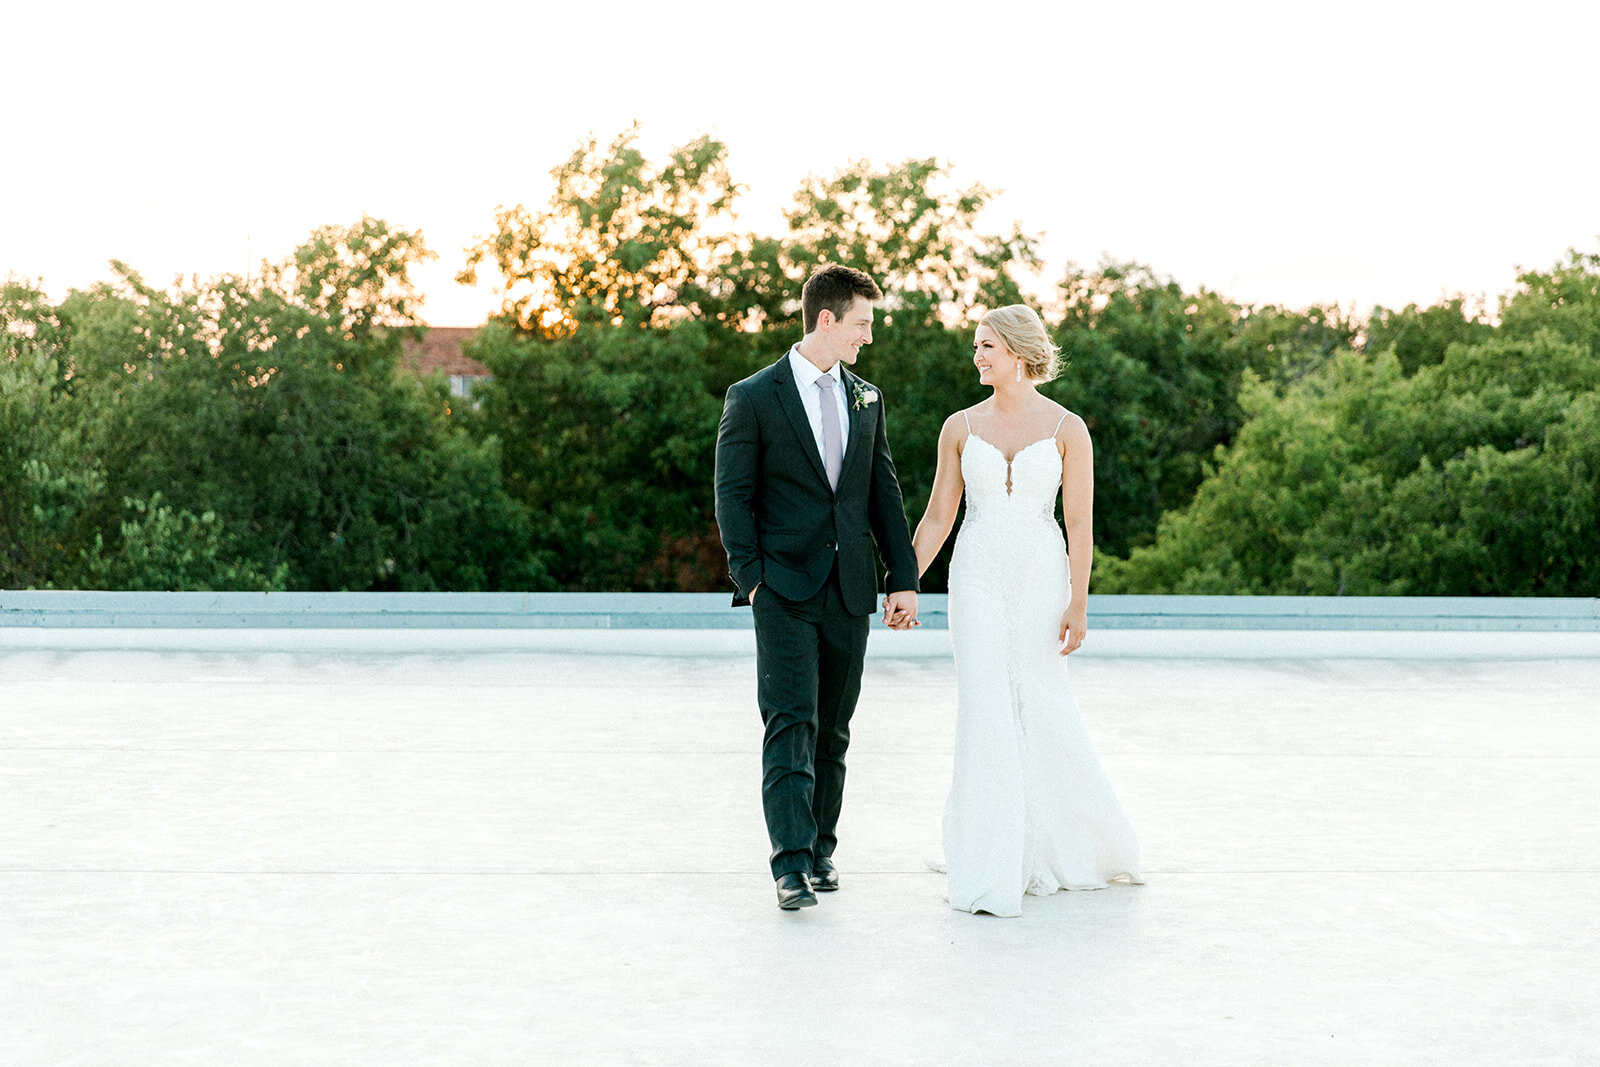 wedding sunset portraits.jpg